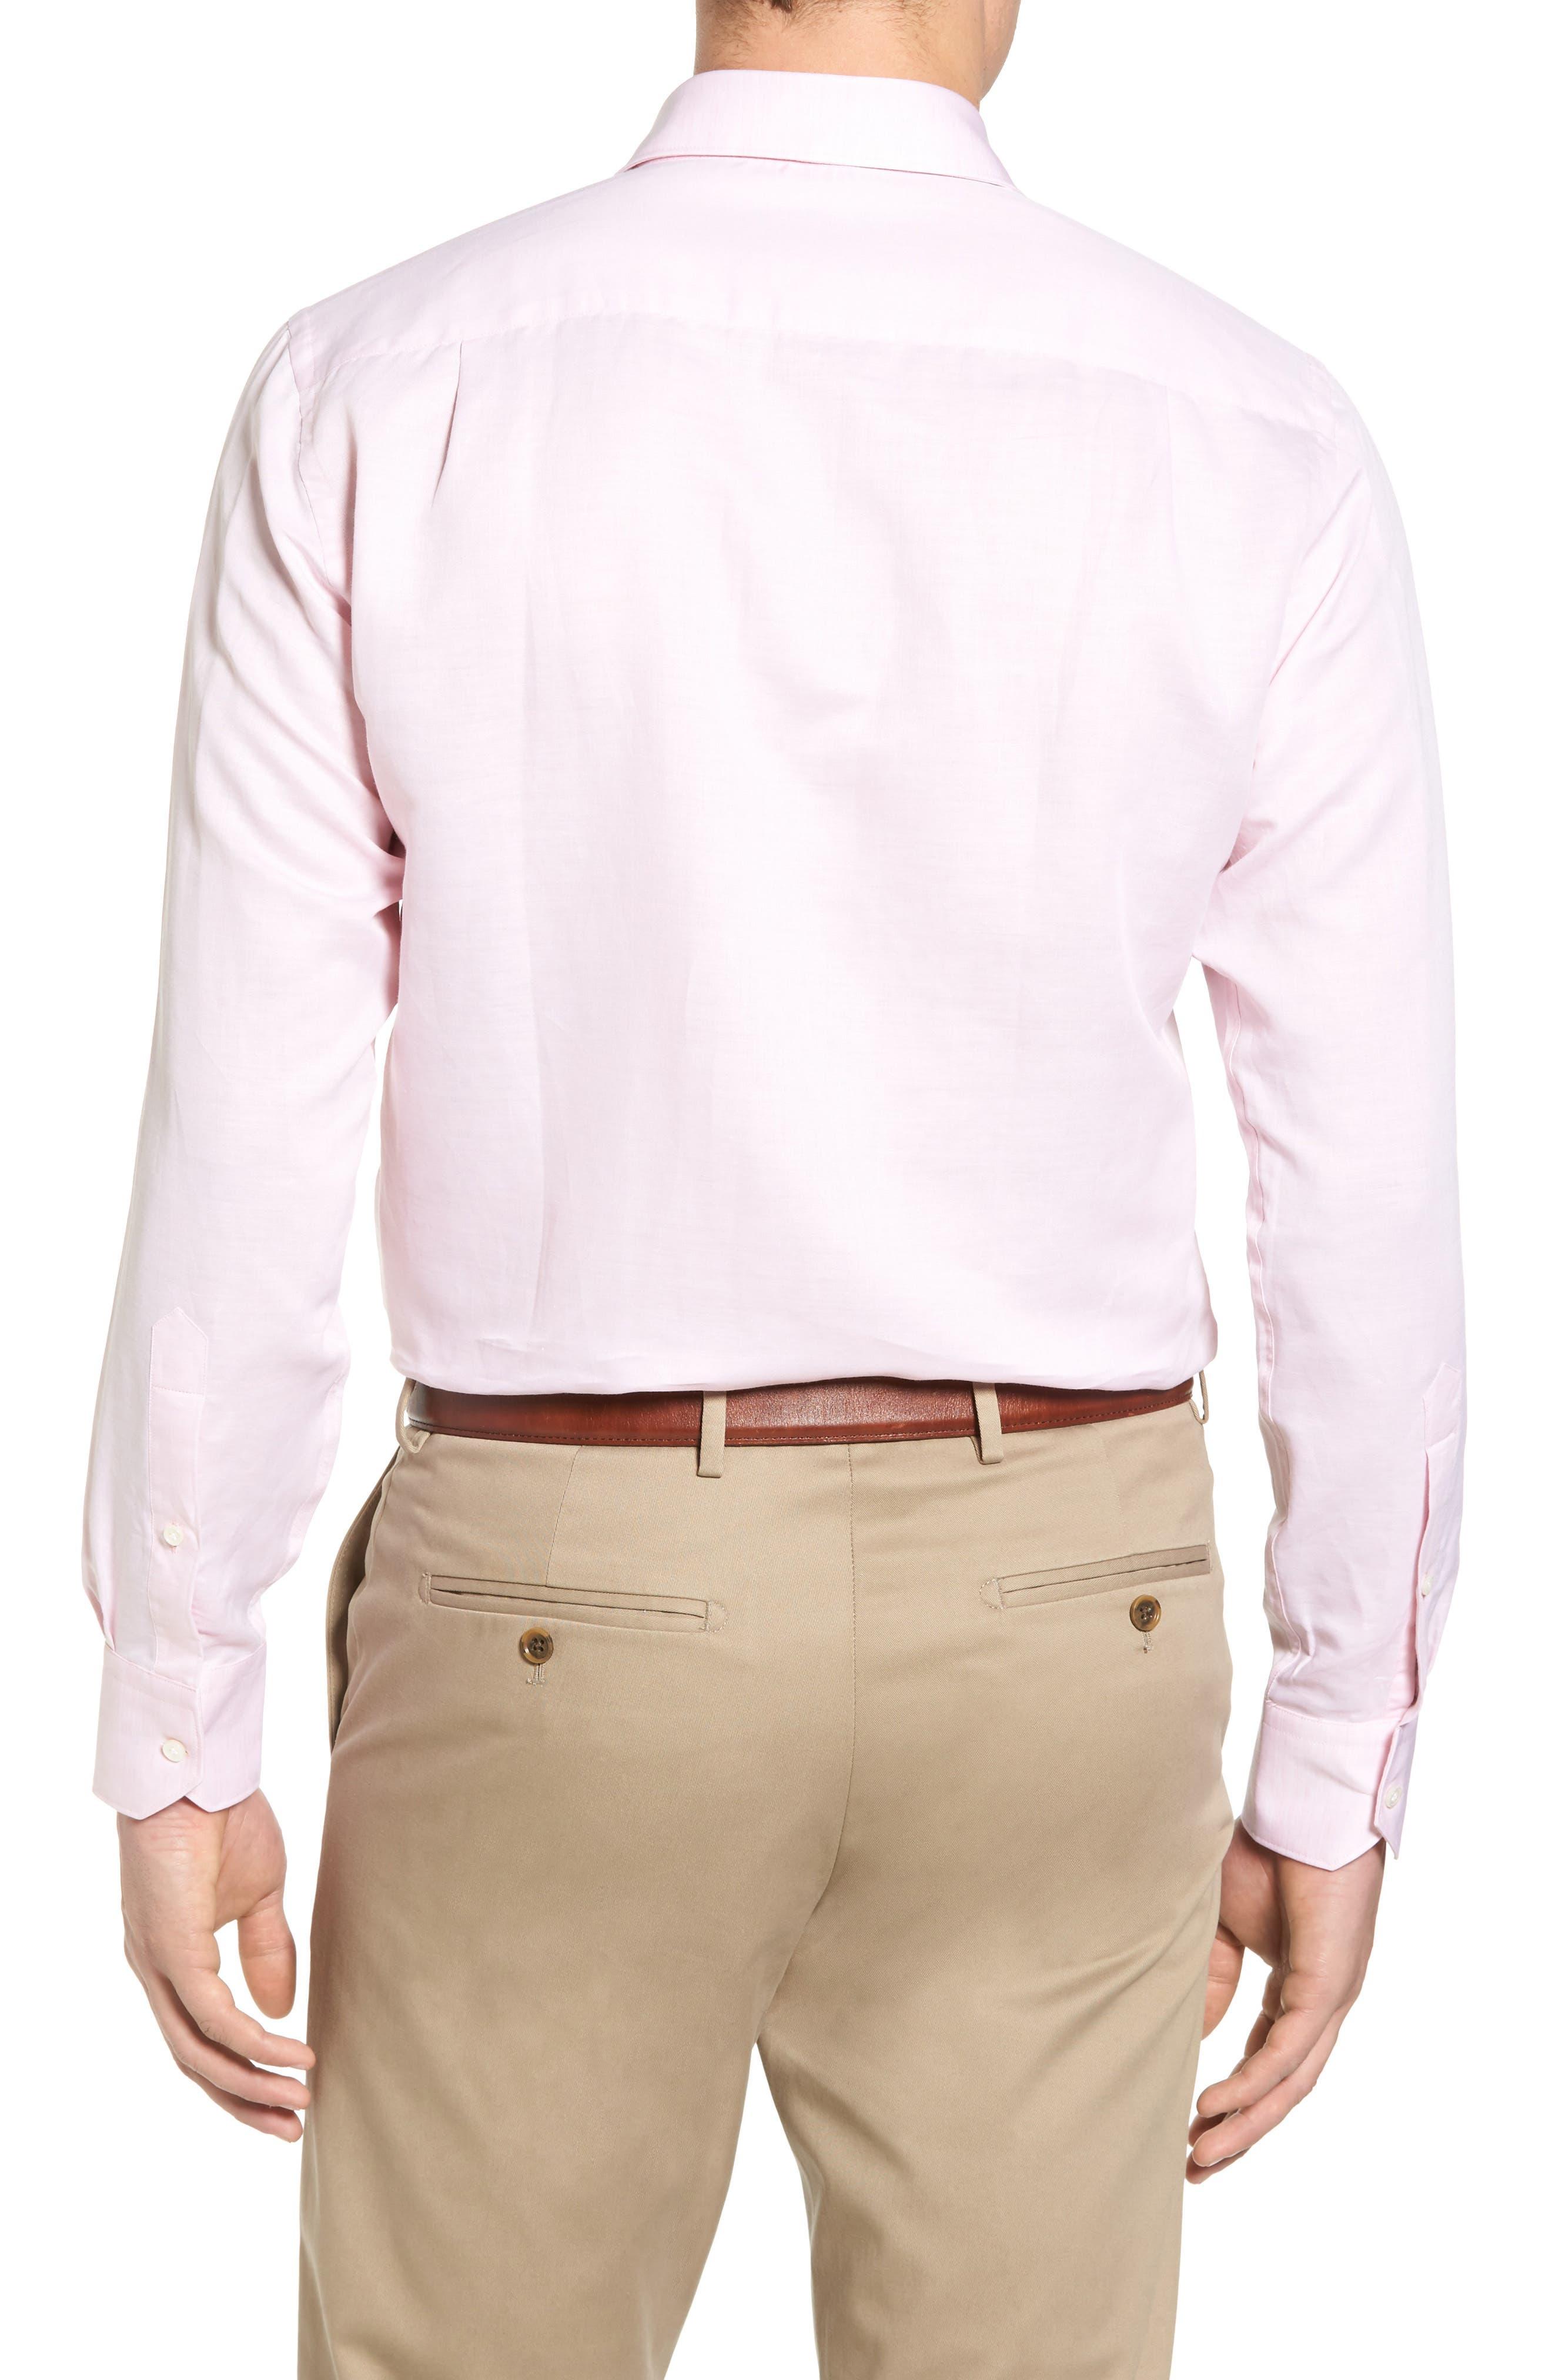 PETER MILLAR COLLECTION,                             Linen & Cotton Sport Shirt,                             Alternate thumbnail 2, color,                             626